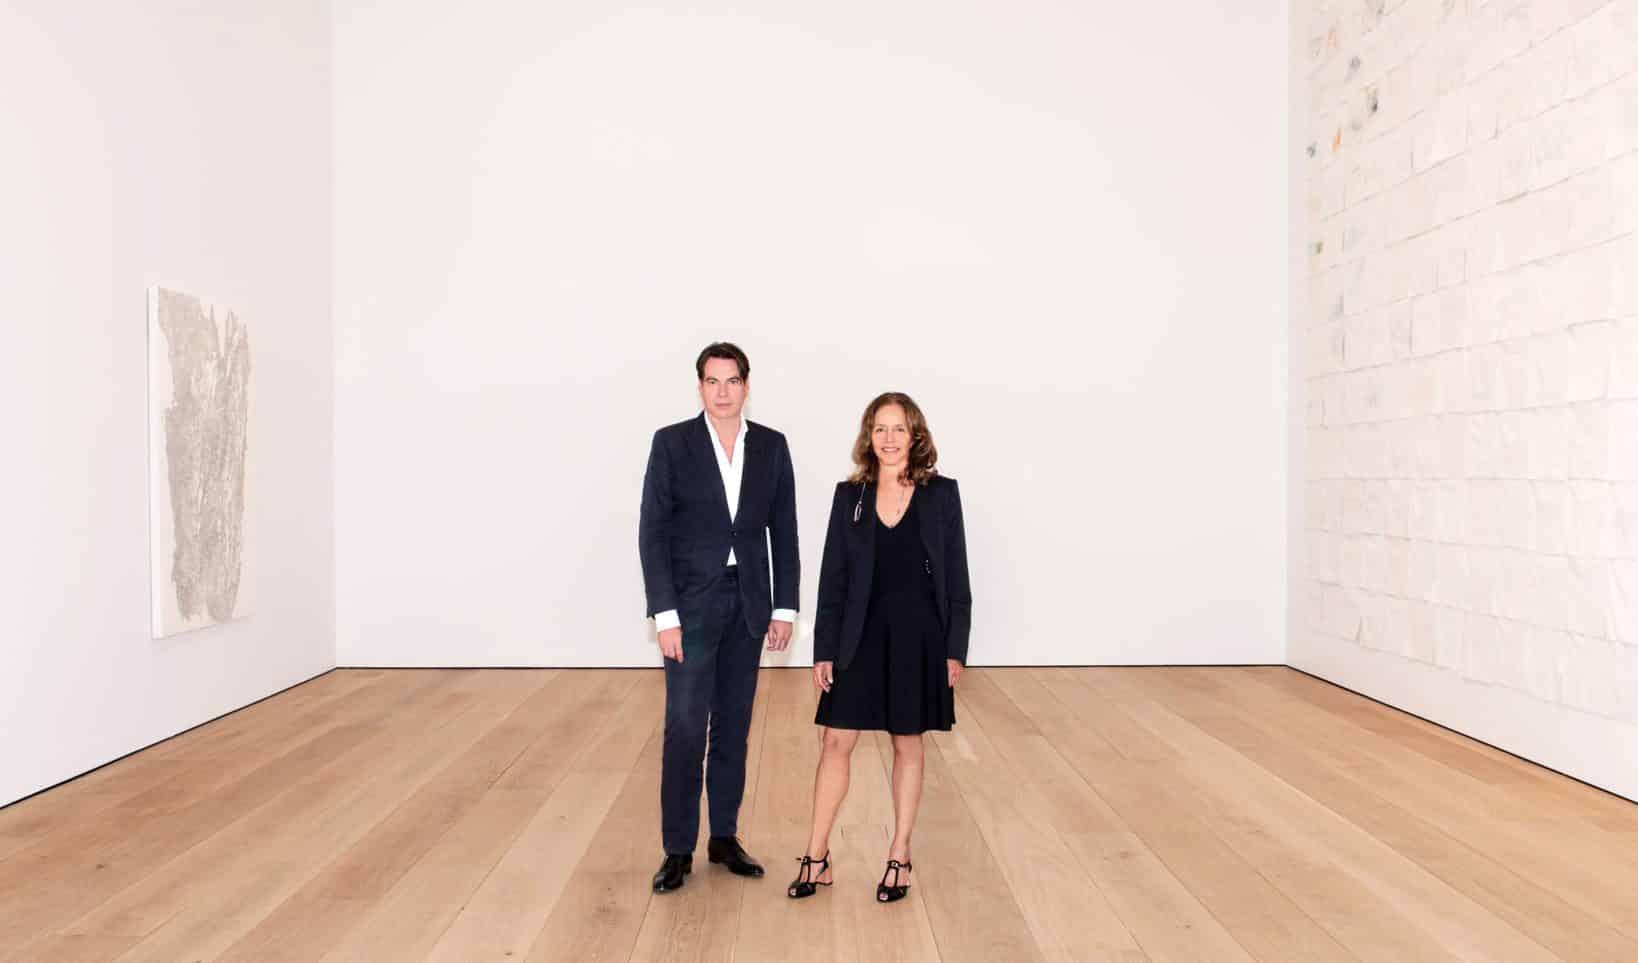 David Maupin and Rachel Lehmann